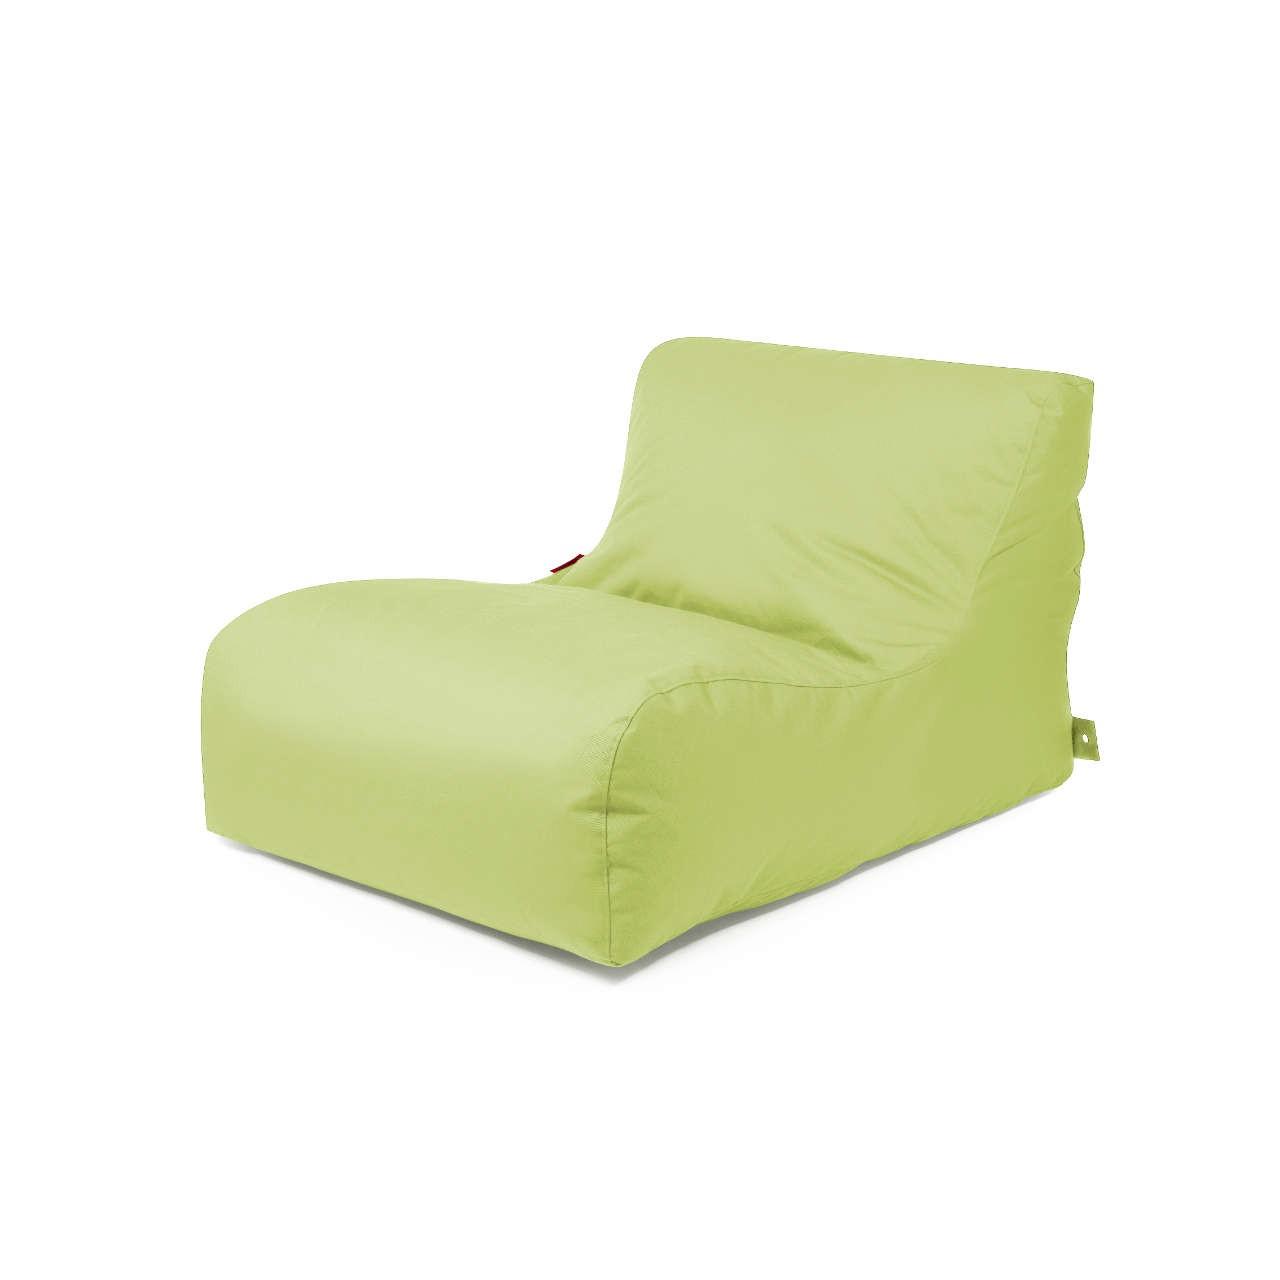 Outbag Sitzsack Newlounge 01NLPLU-LIM plus lime